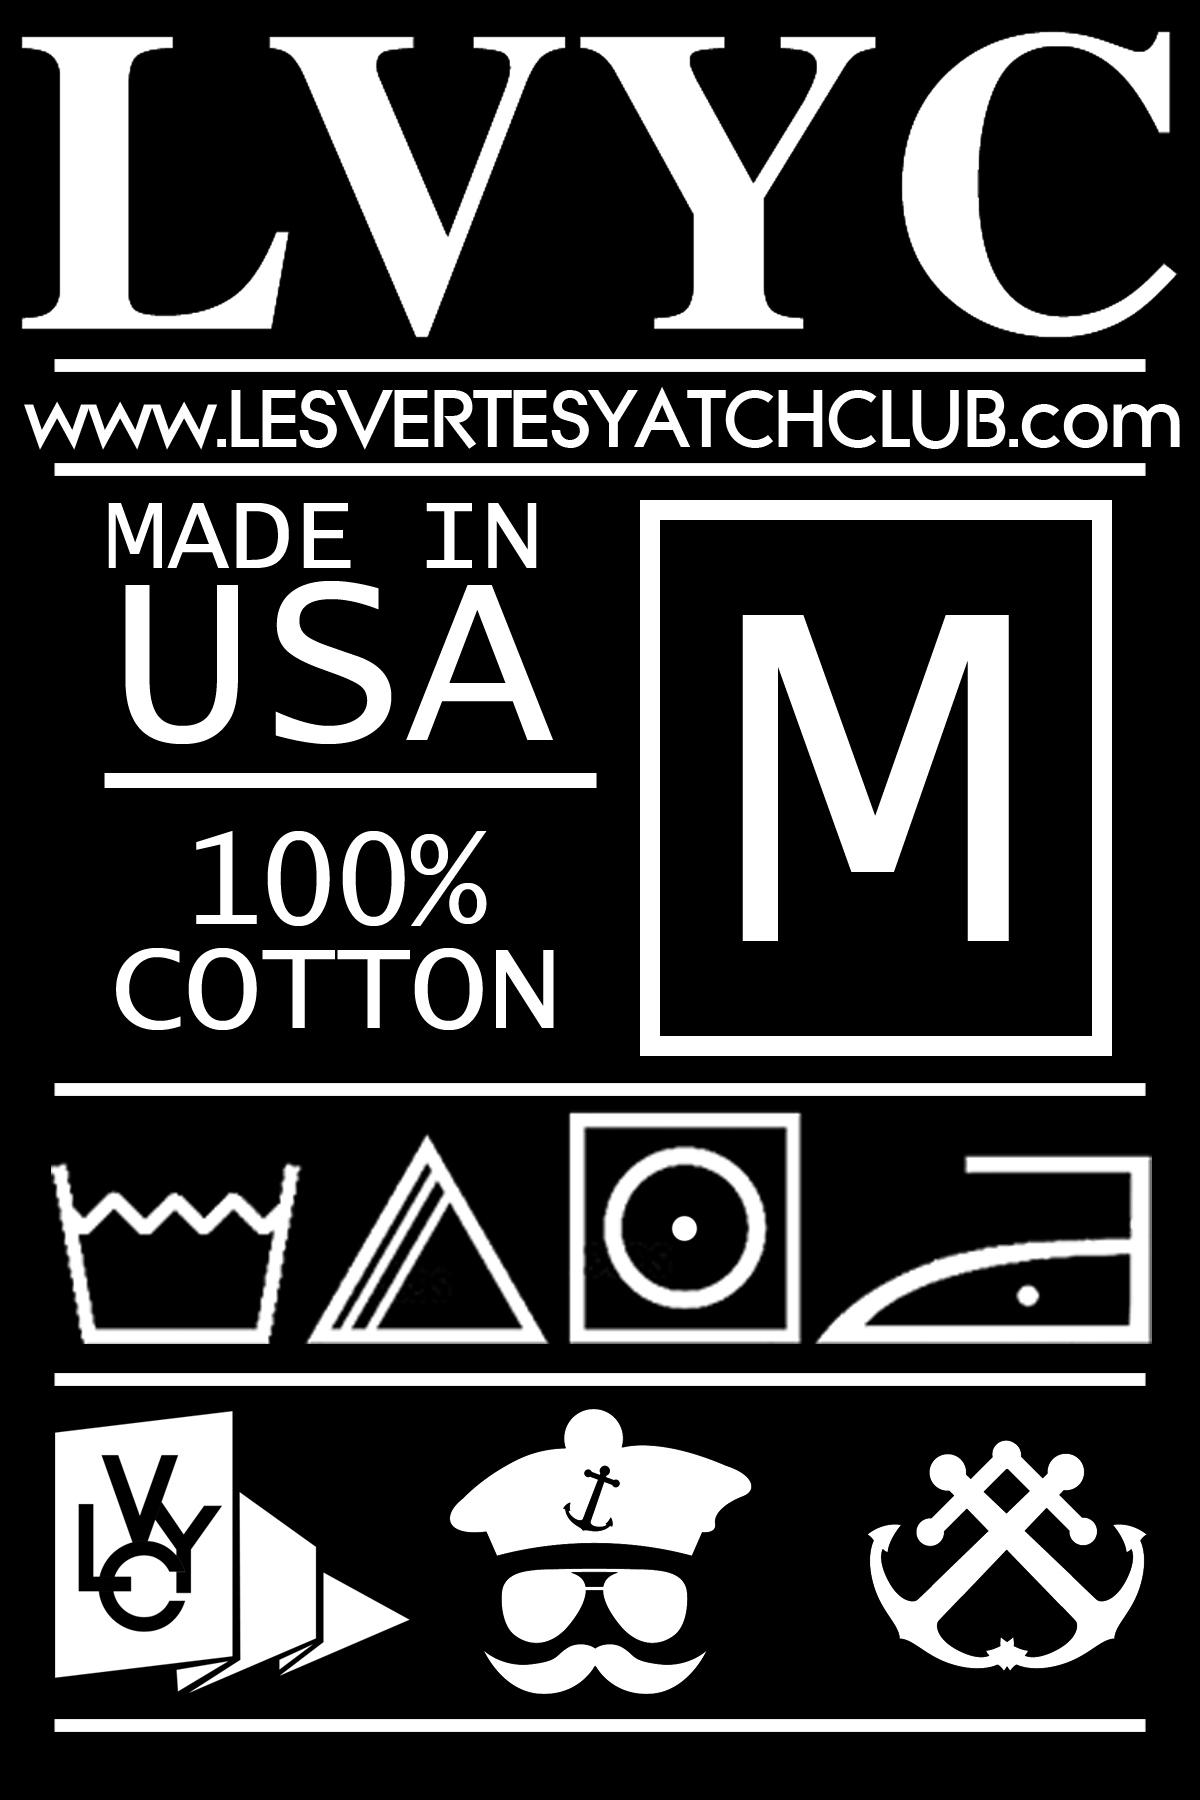 LVYC_Tag2012_1 black.jpg